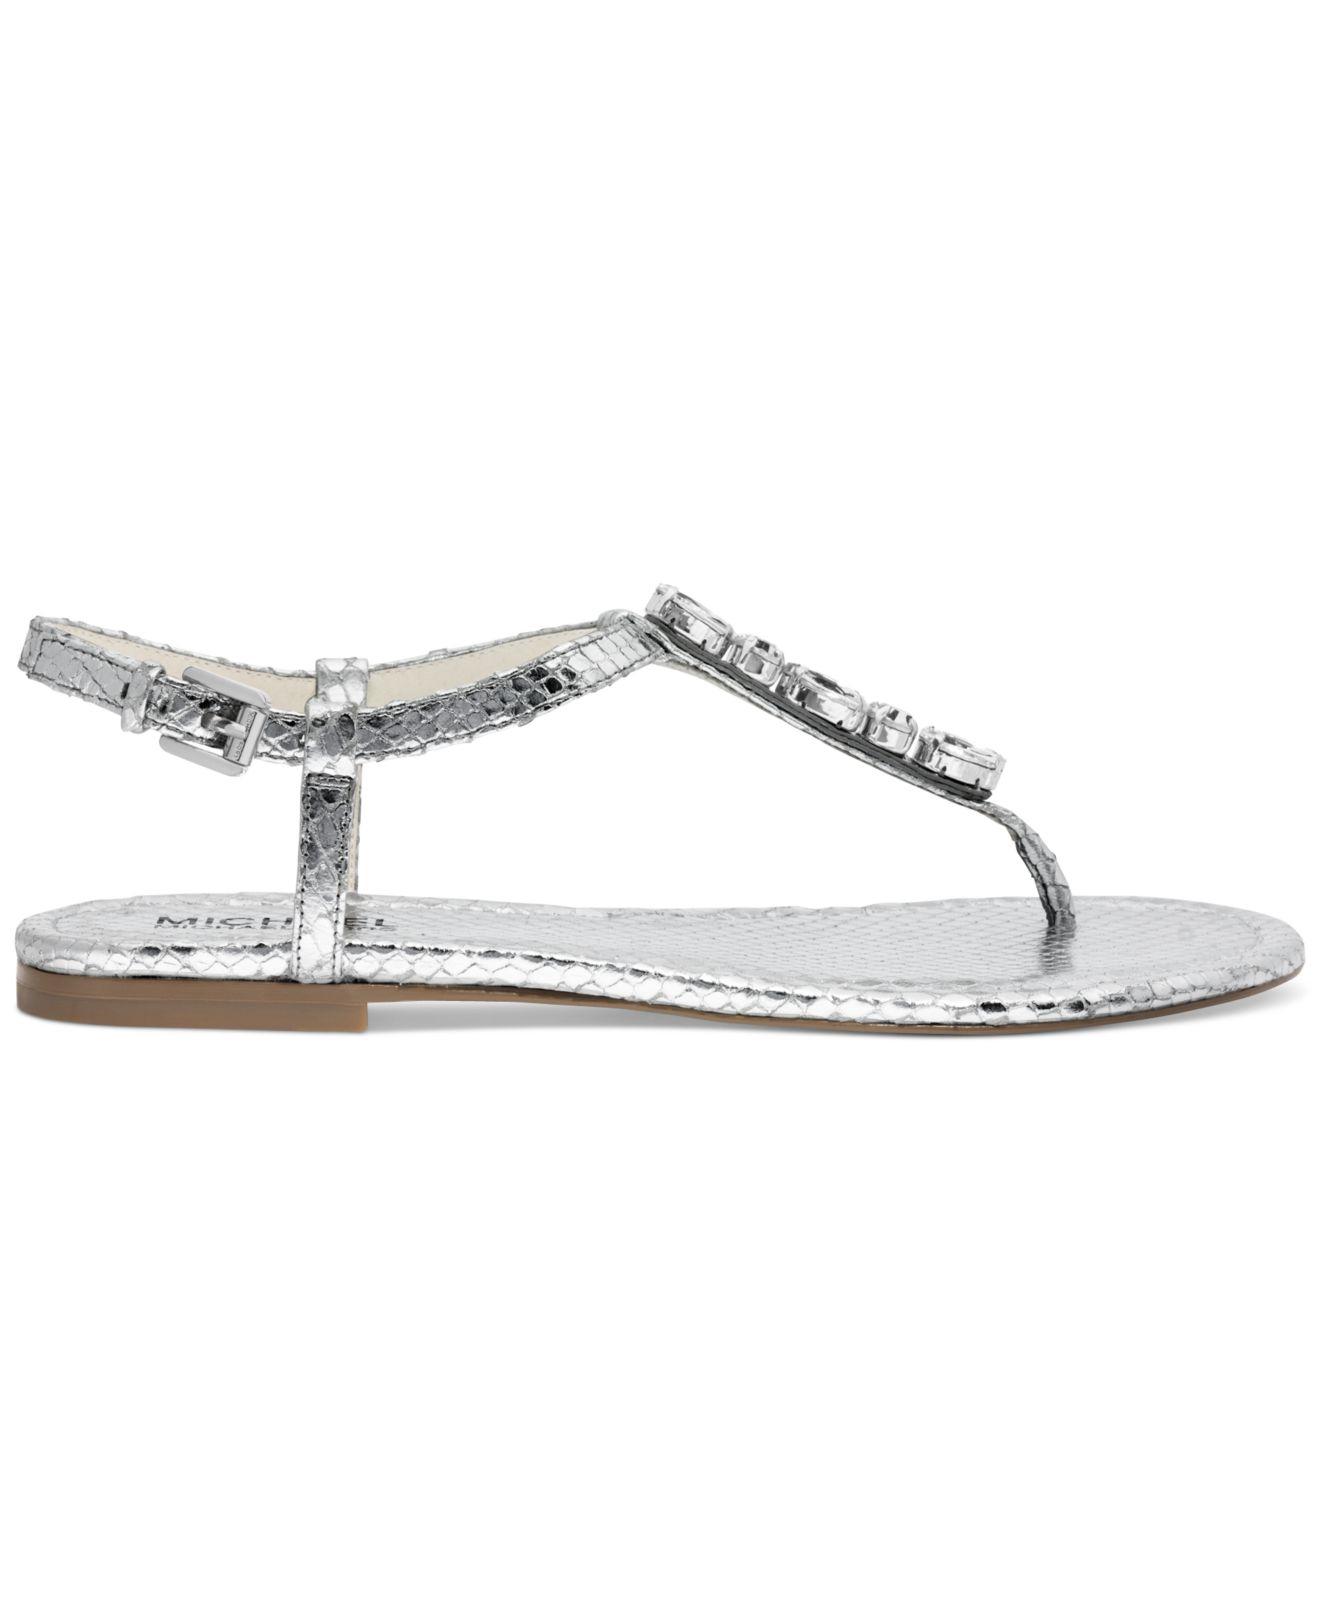 7c4dce761 Lyst - Michael Kors Michael Jayden Jeweled Flat Thong Sandals in ...